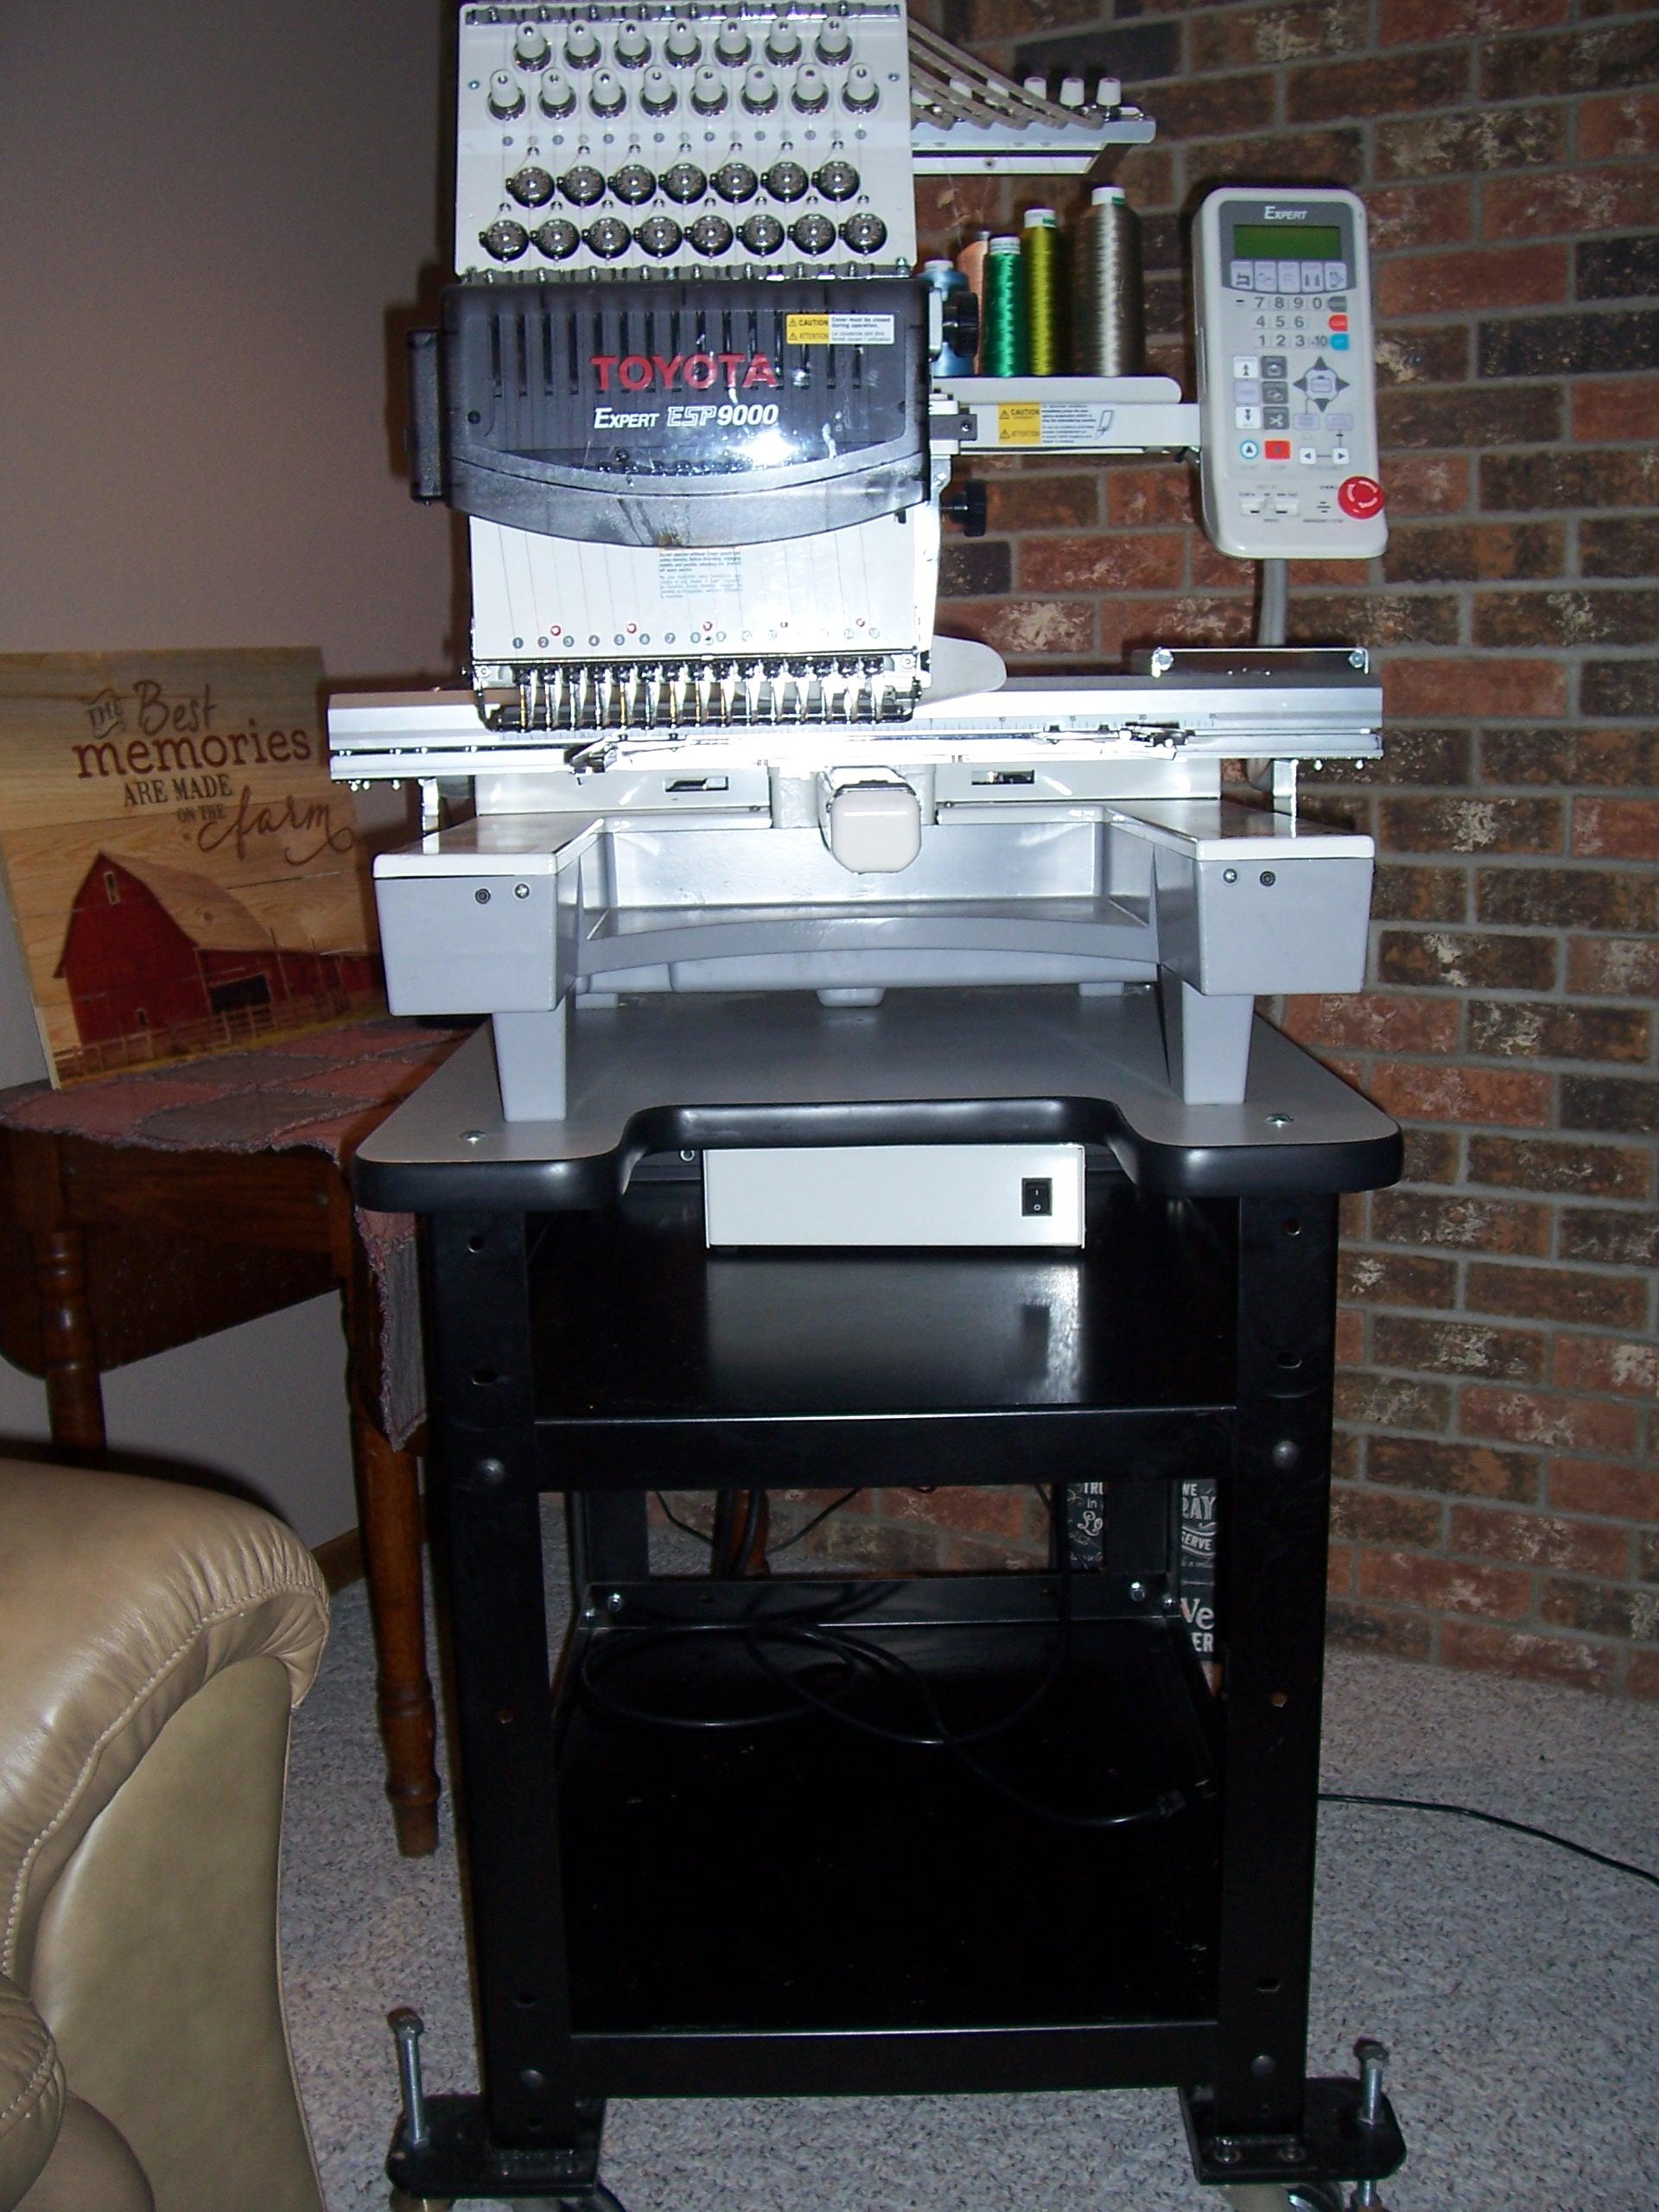 New toyota 850 Embroidery Machine